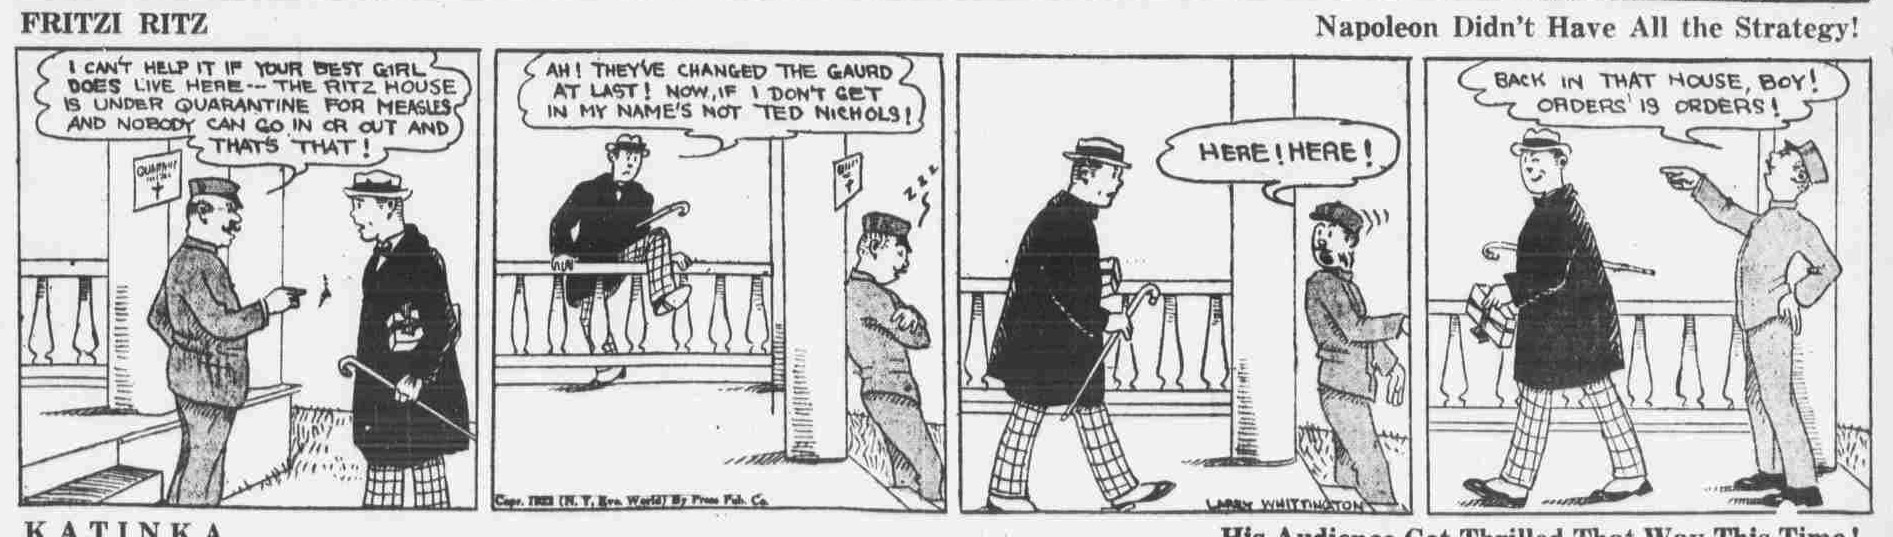 Nov. 24, 1922